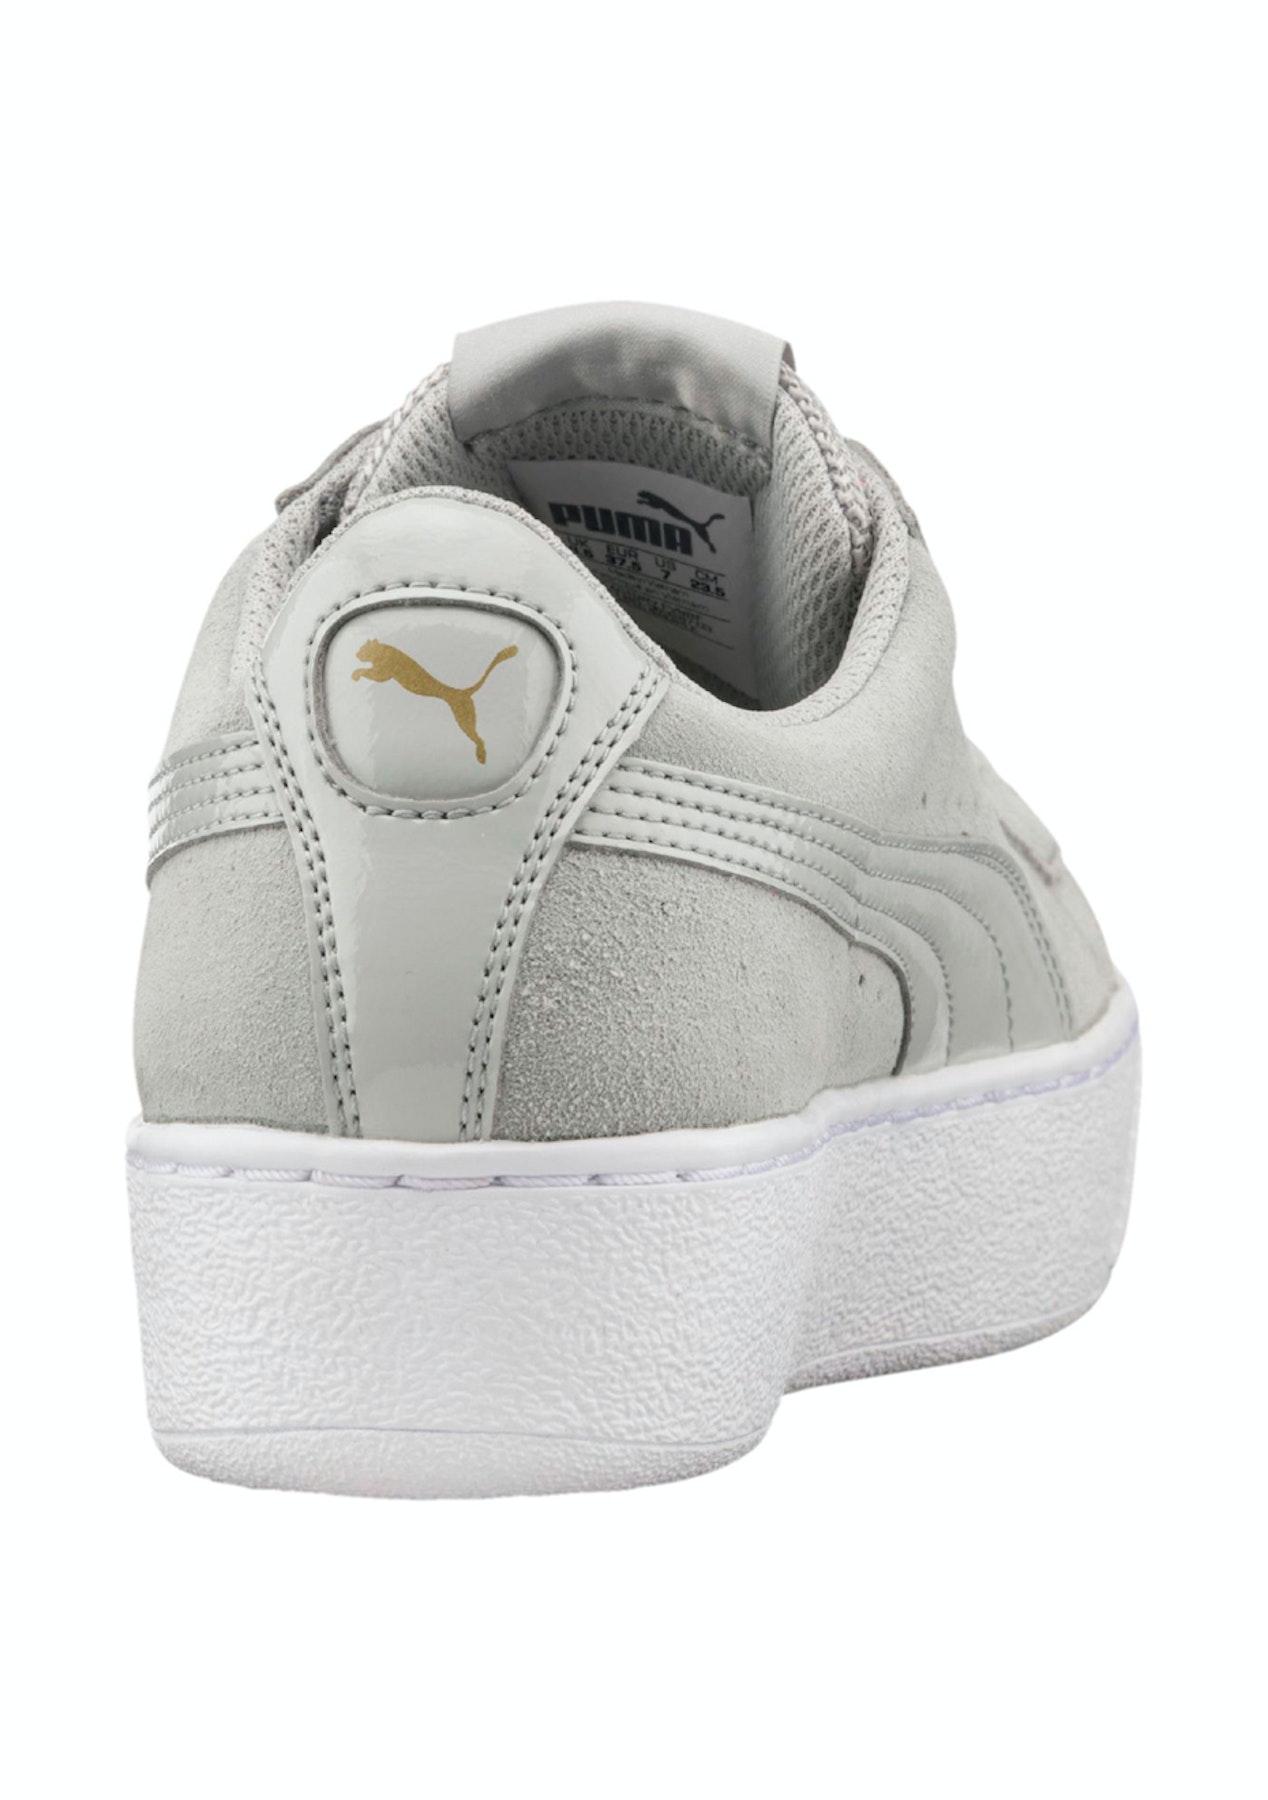 150ee2ebeb7 Puma Womens - Puma Vikky Platform - Grey Violet - Shoe Garage Sale - Onceit